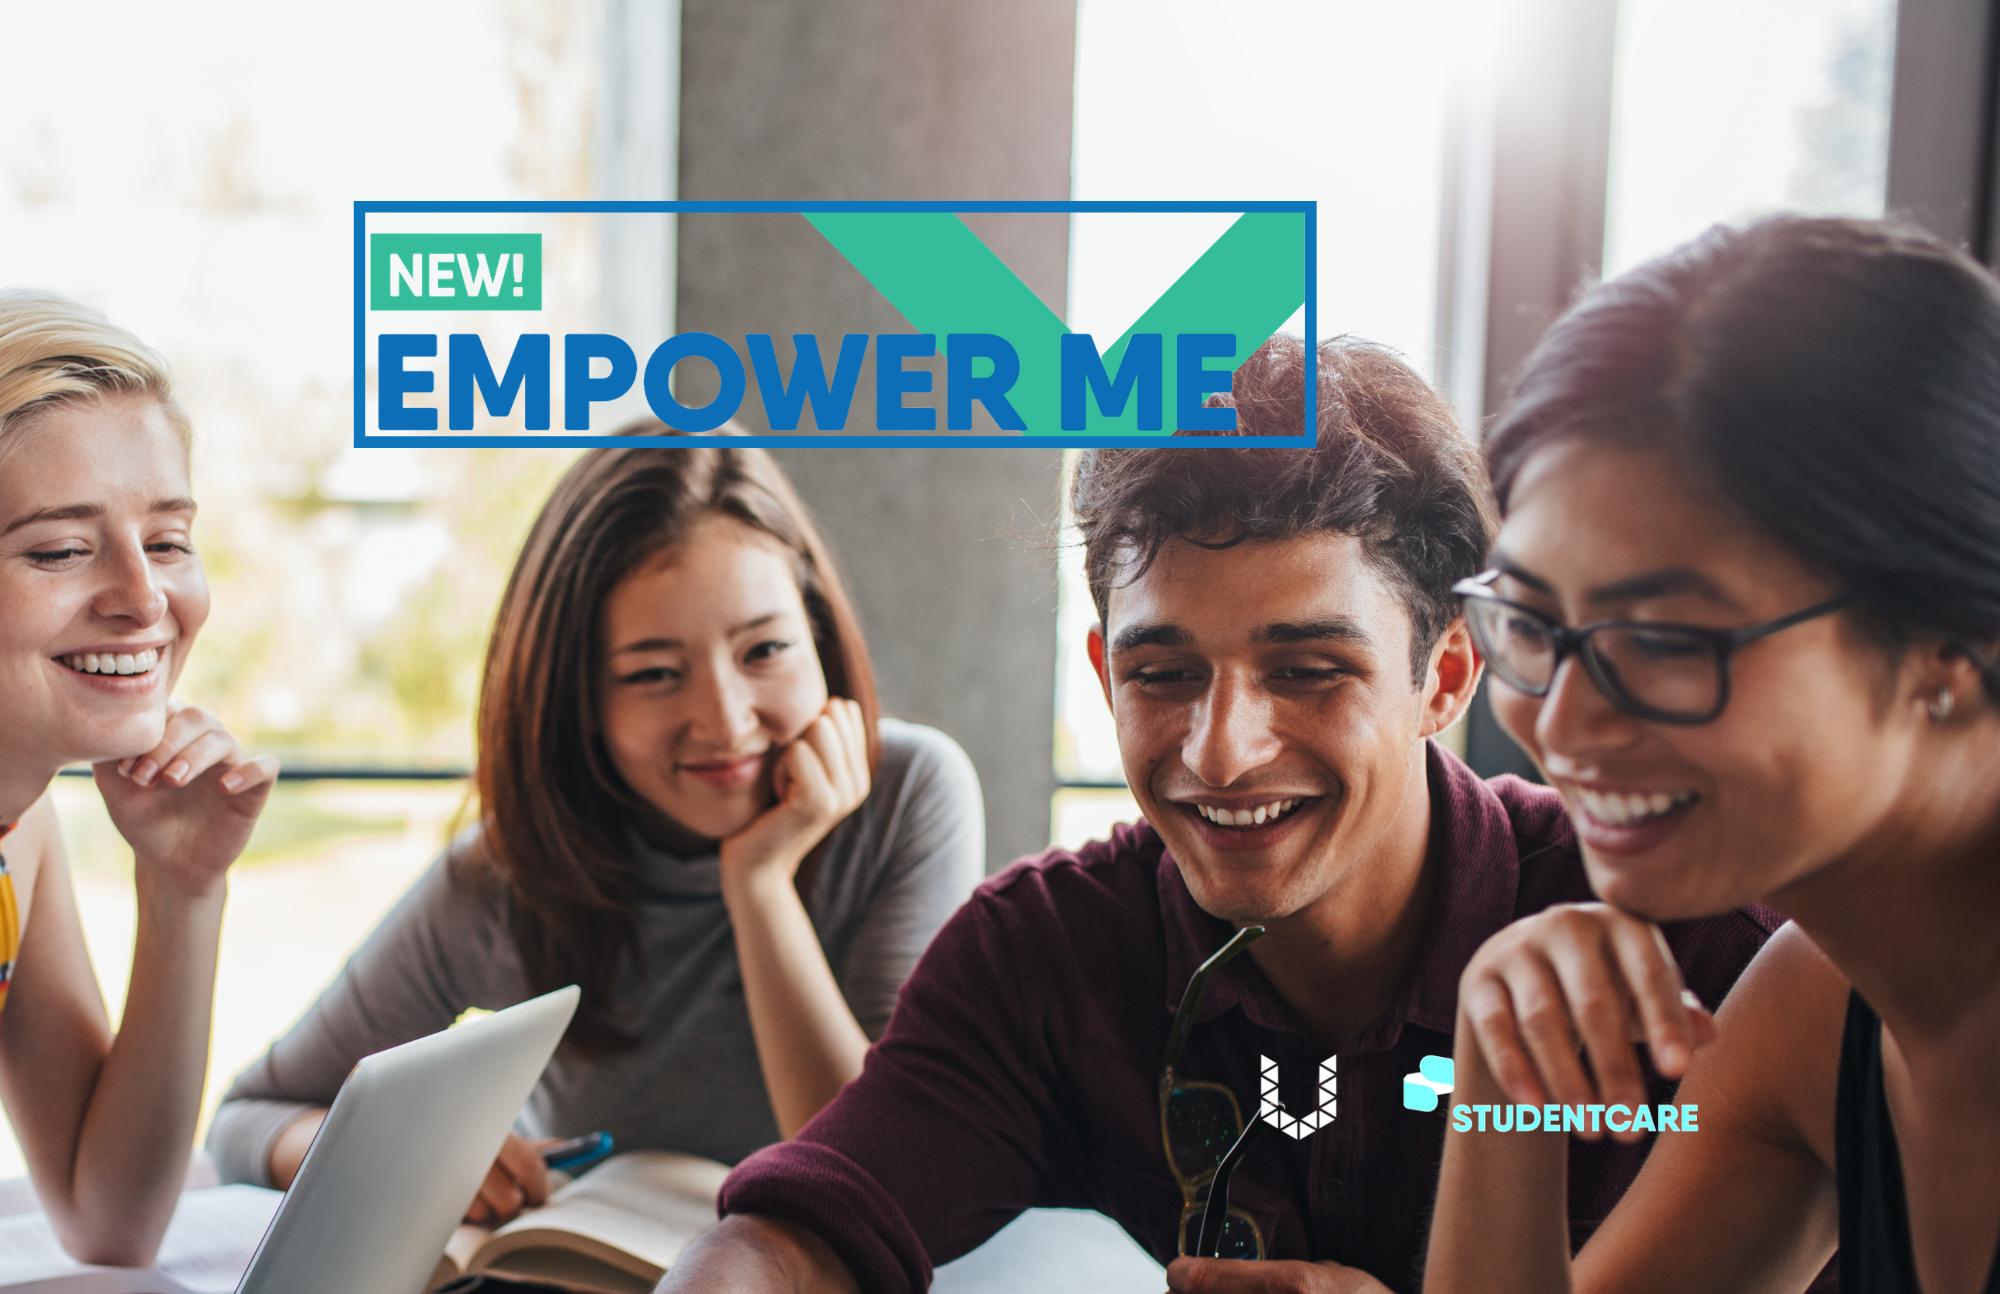 New! Empower Me image of people sitting around a table, smiling, UTSU logo, StudentCare logo